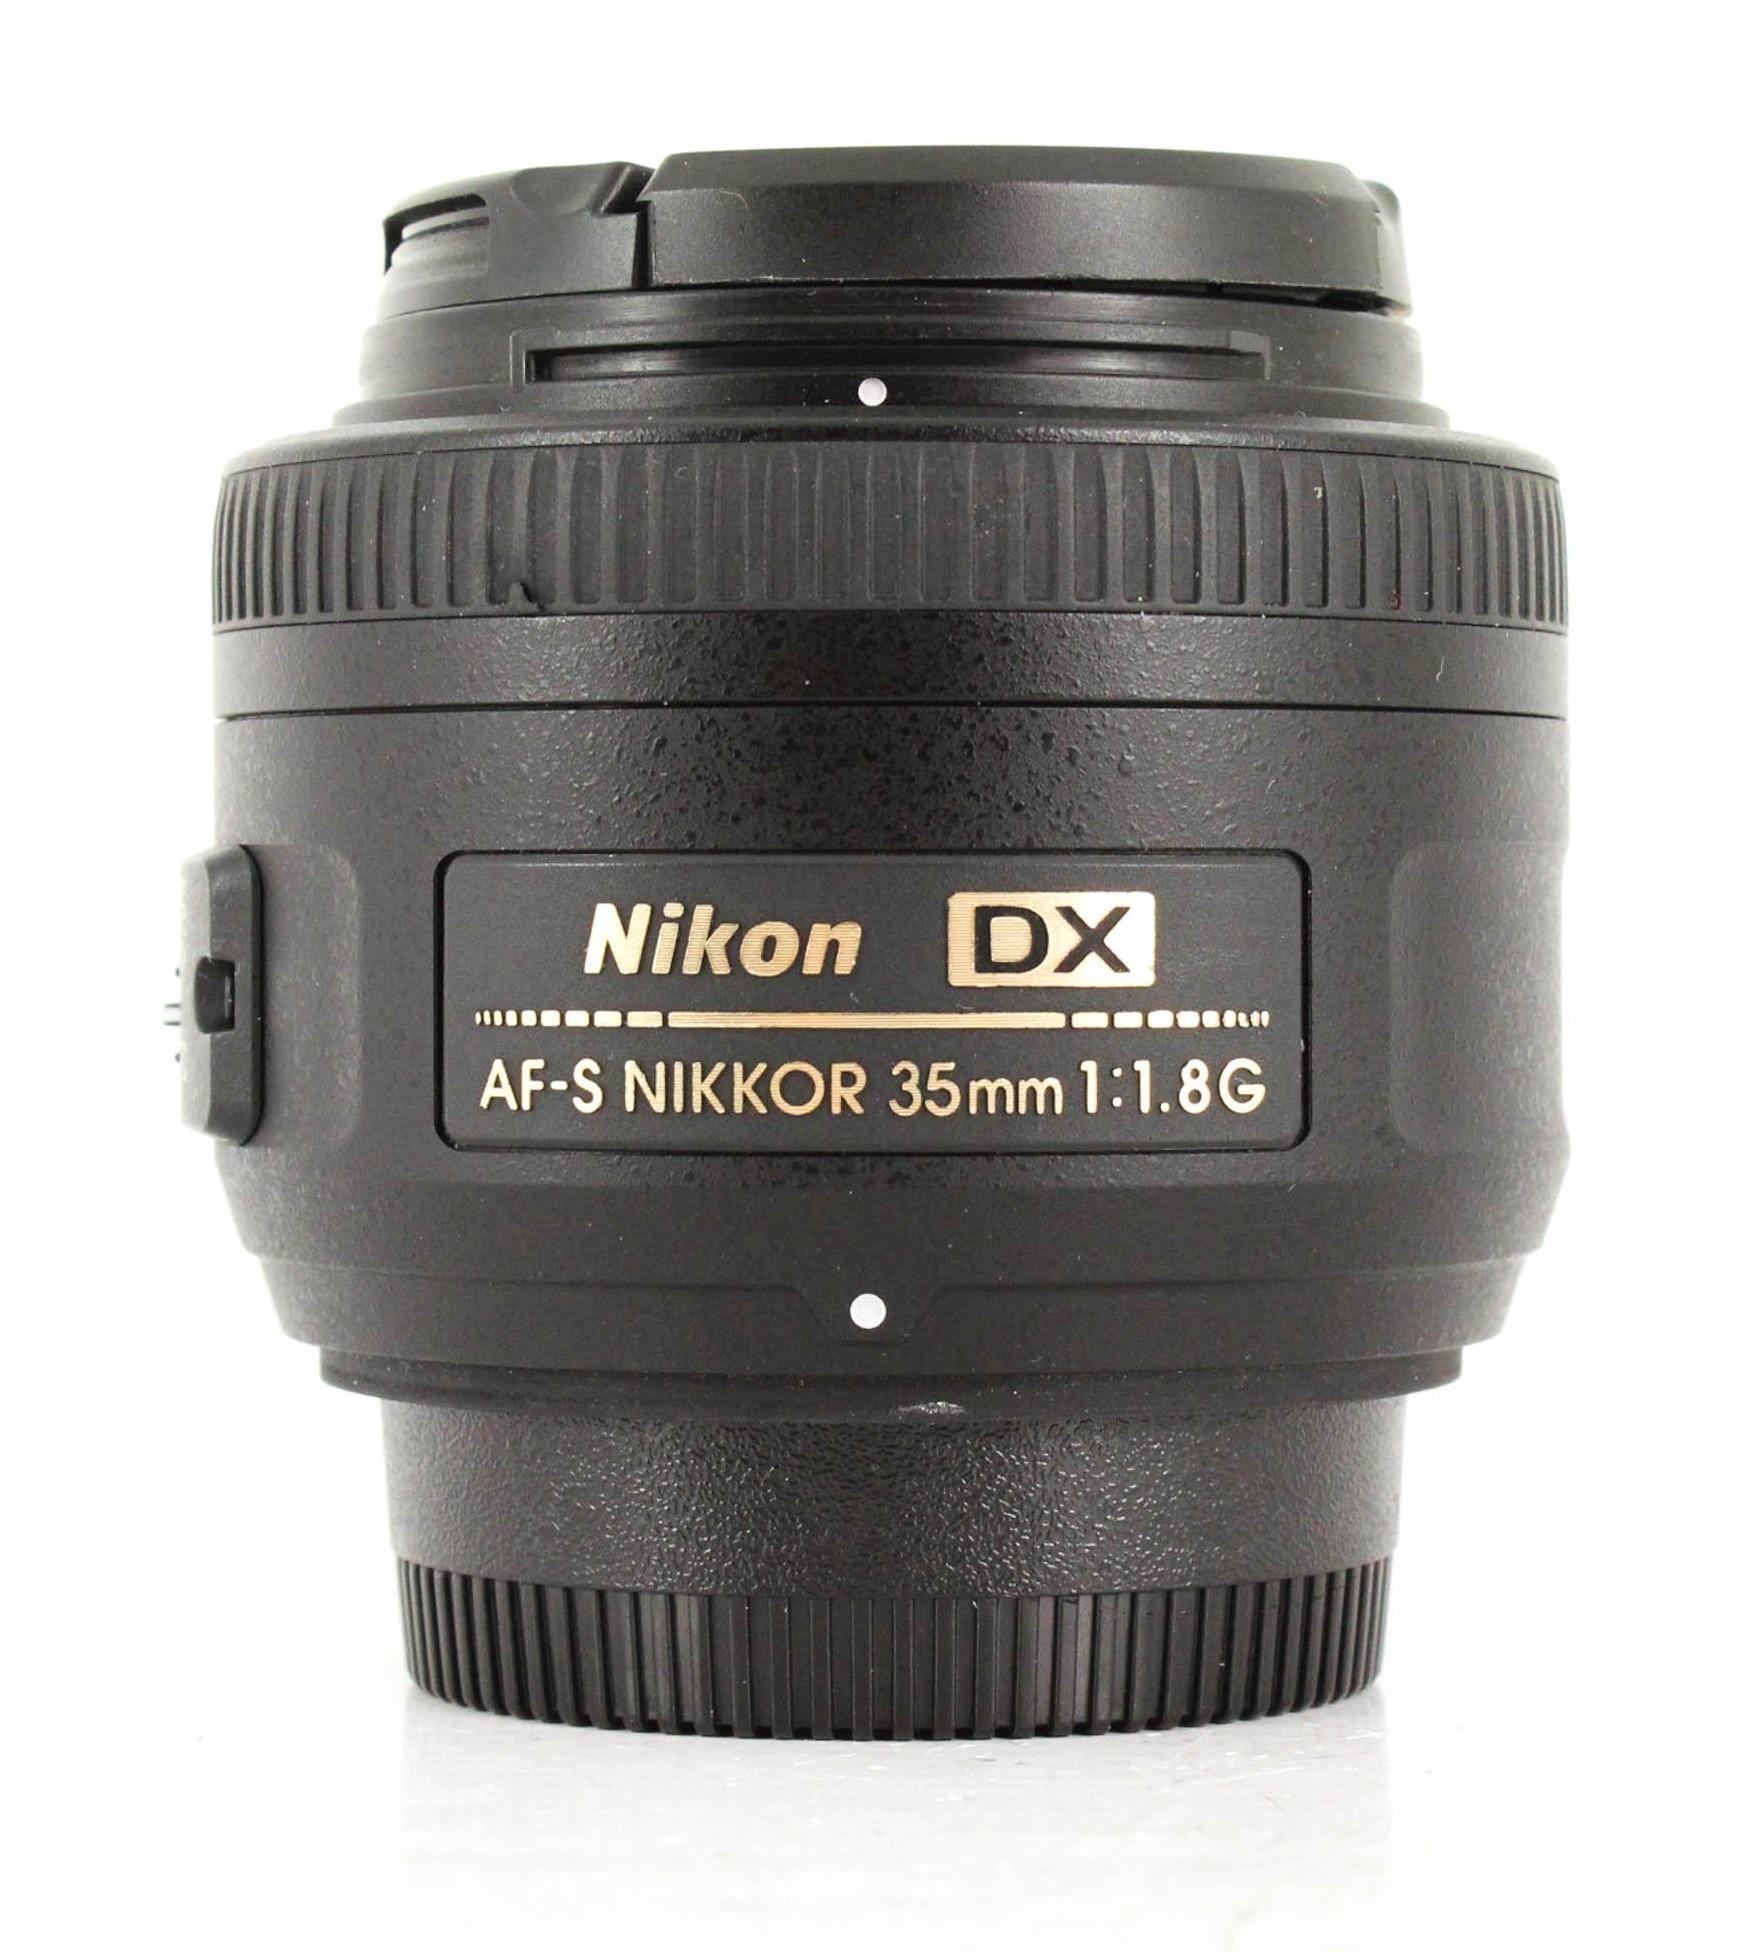 nikon 35mm f1.8g image